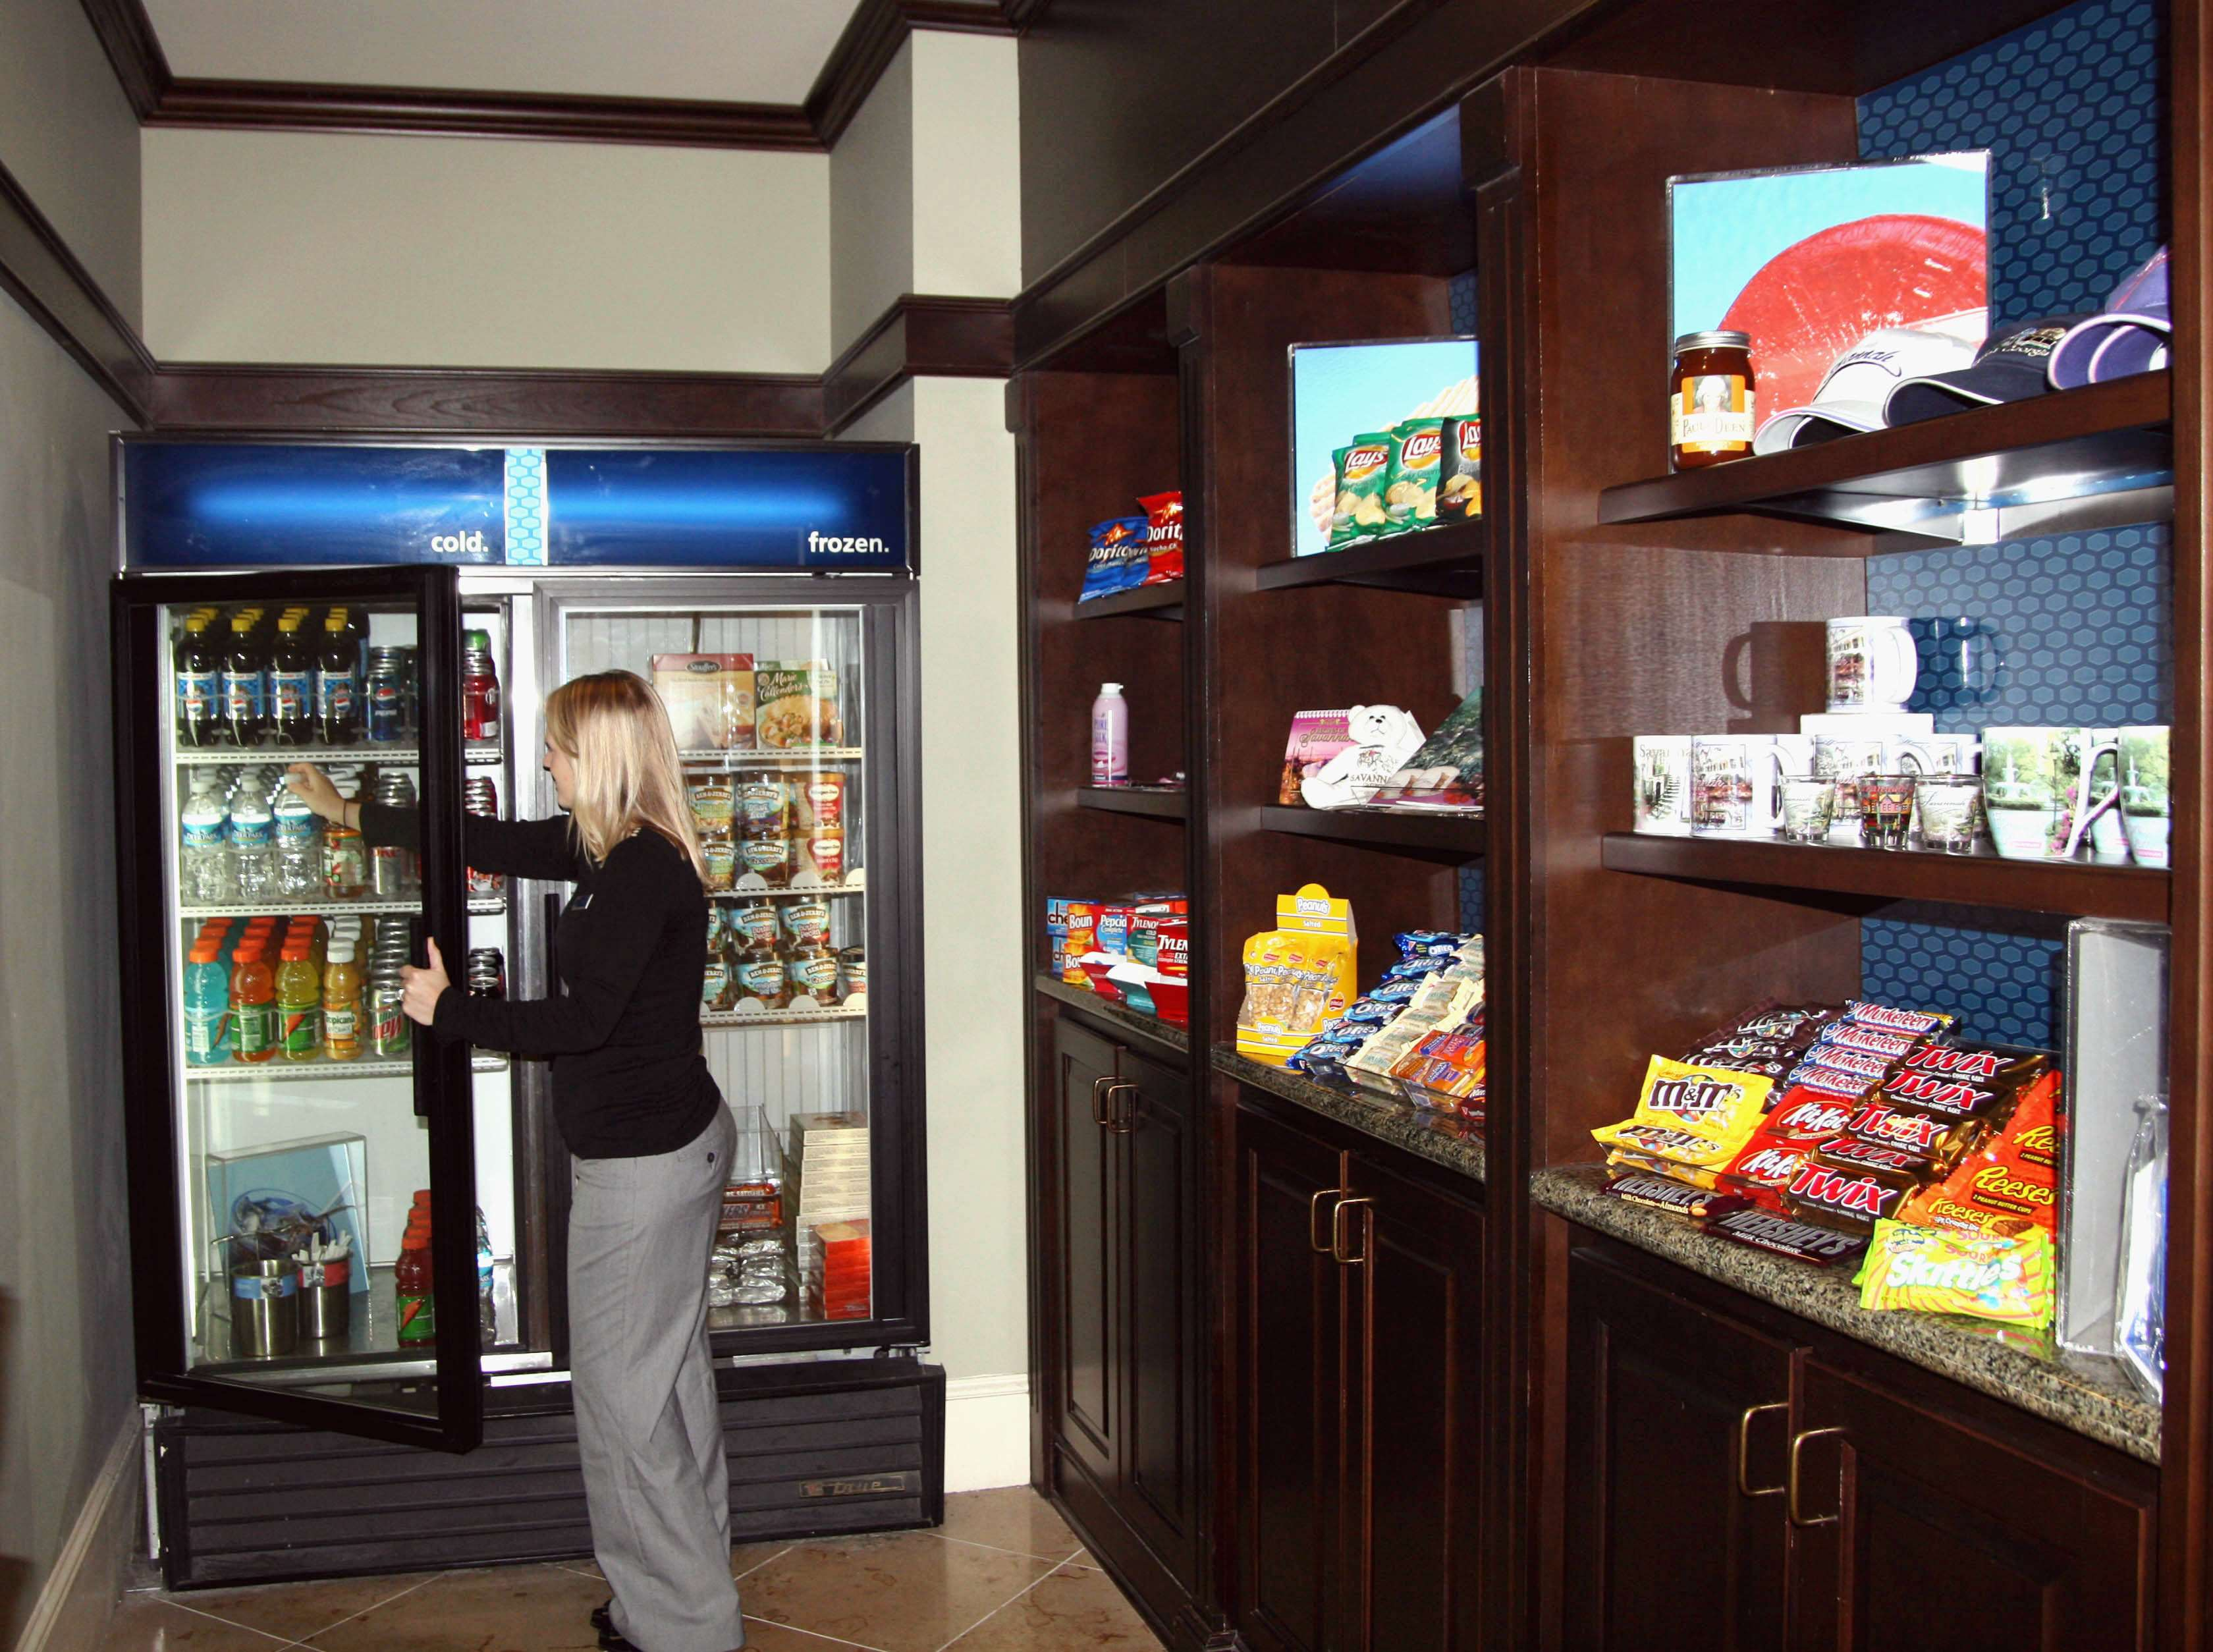 Hampton Inn & Suites Savannah Historic District image 22